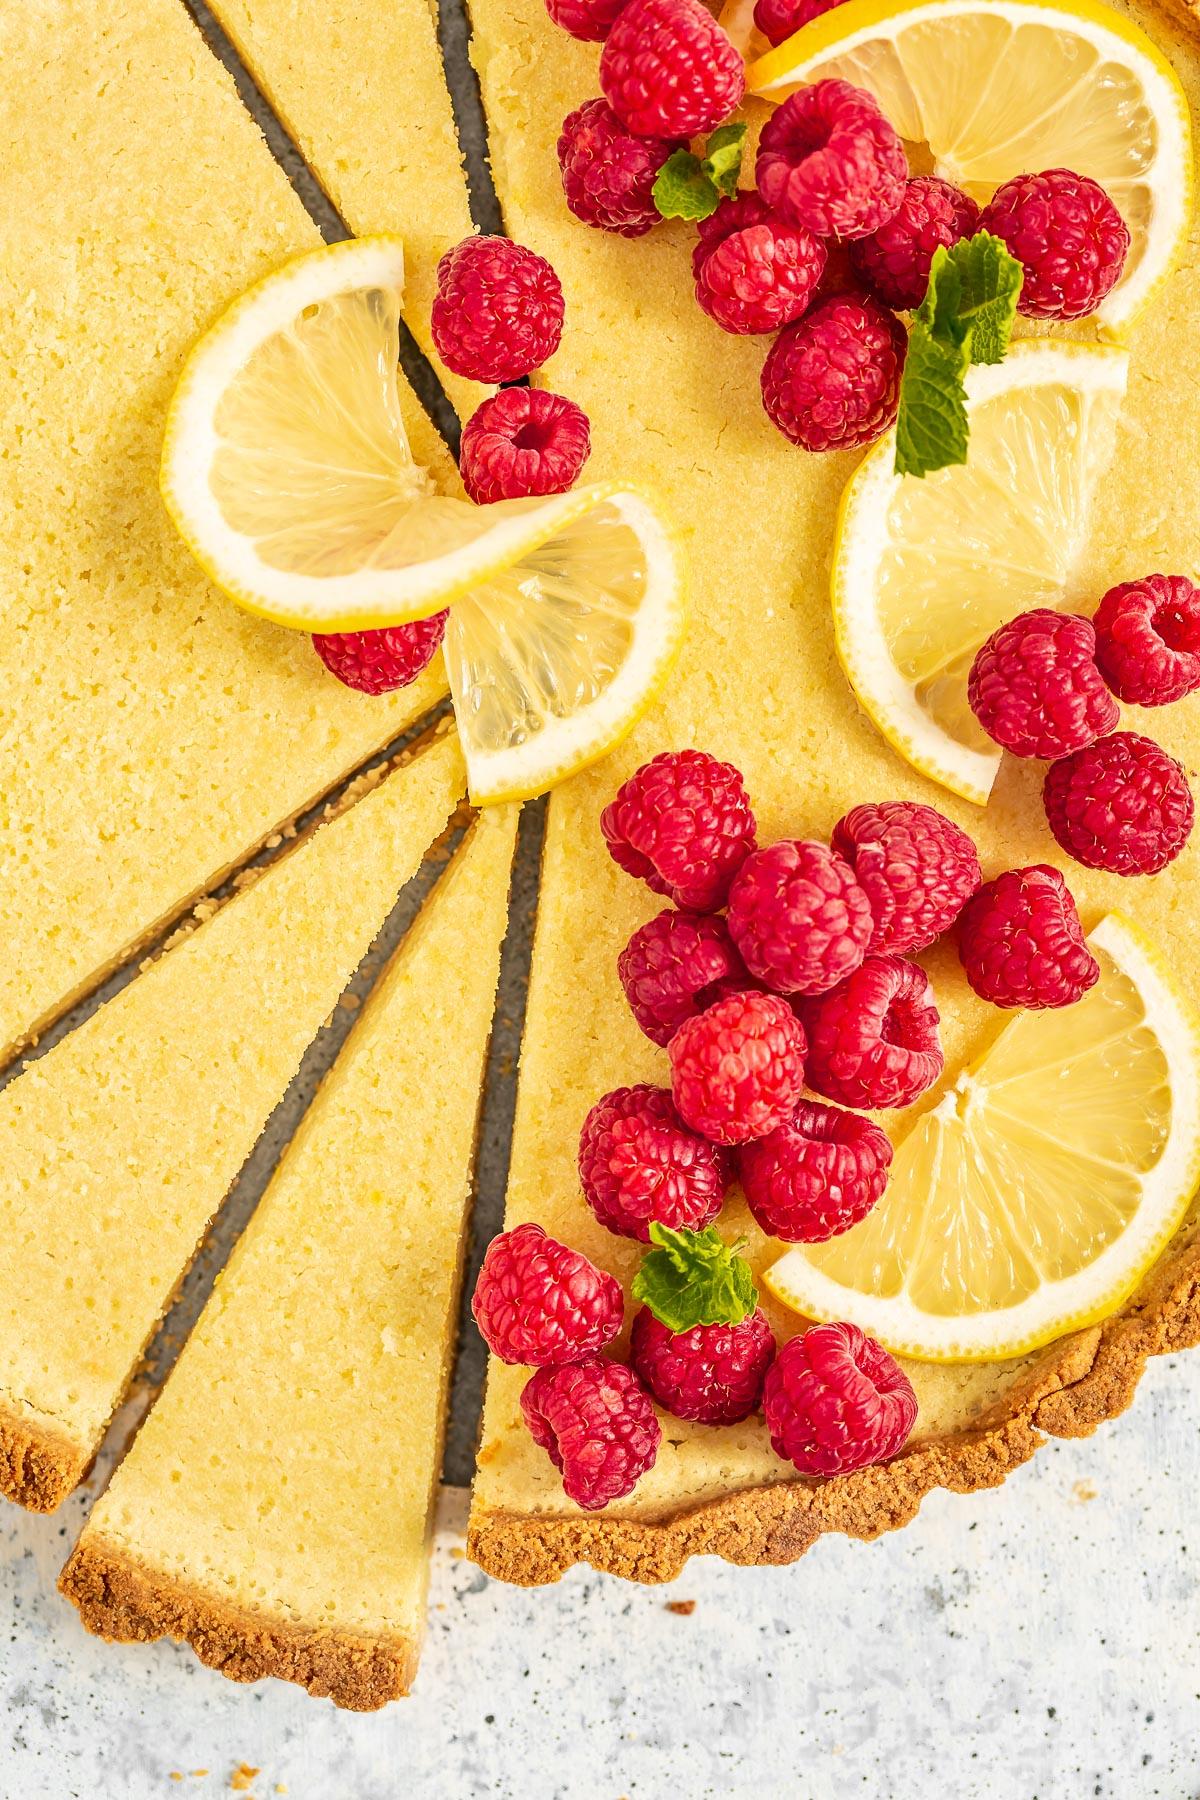 Refined Sugar-Free Gluten-Free Vegan Lemon Tart with Almond Crust CROSTATA al LIMONE VEGAN con pasta FROLLA ALLE MANDORLE senza glutine